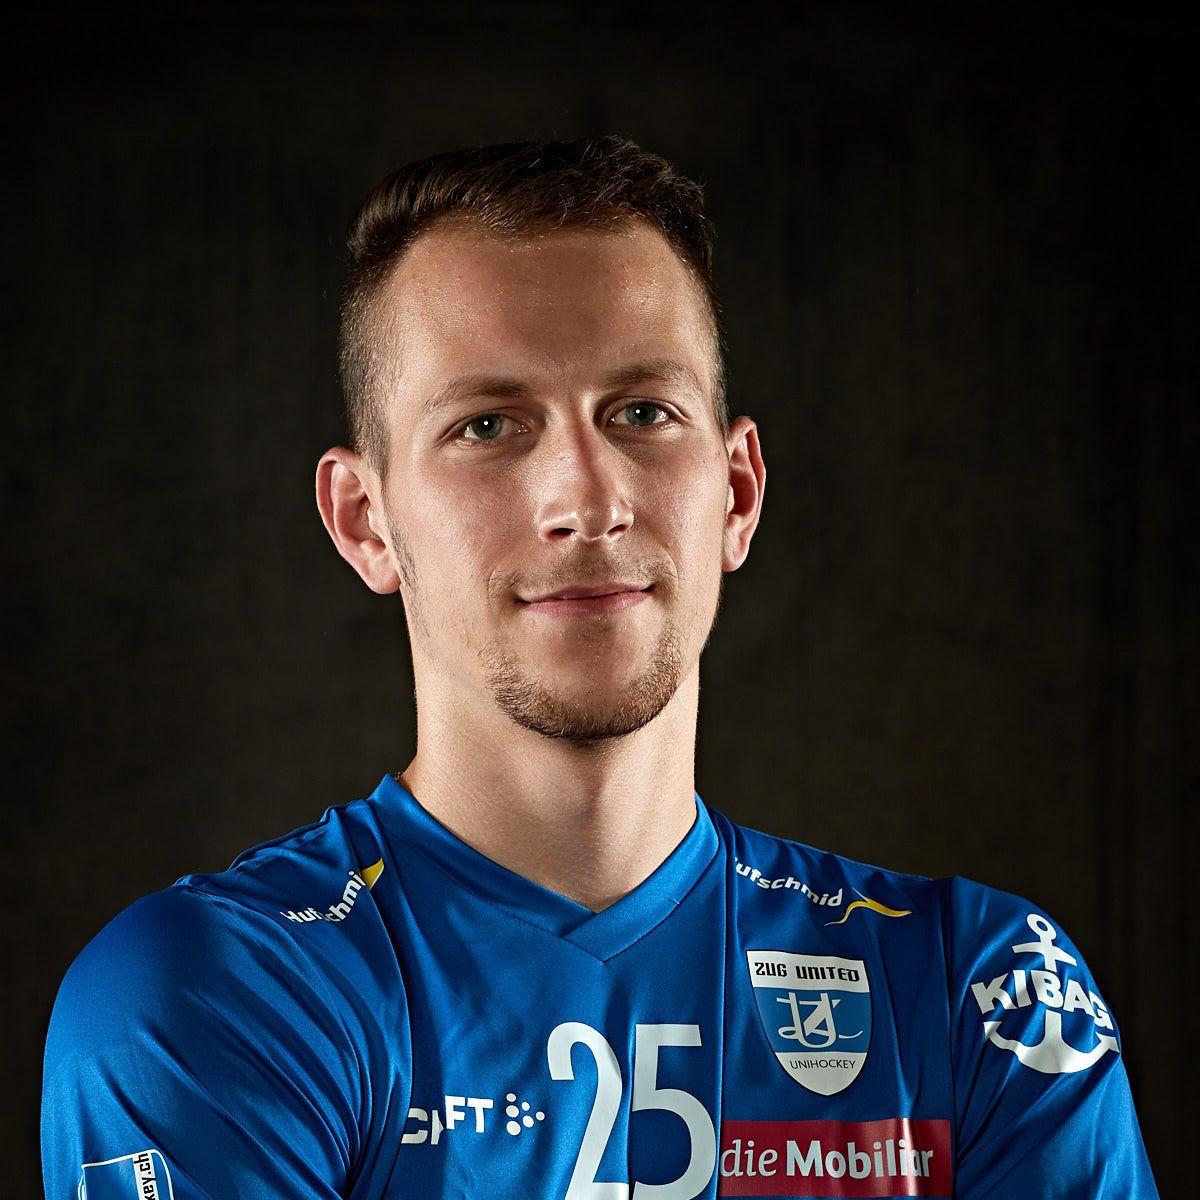 Zug United Männer NLA Adrian Furger.jpg